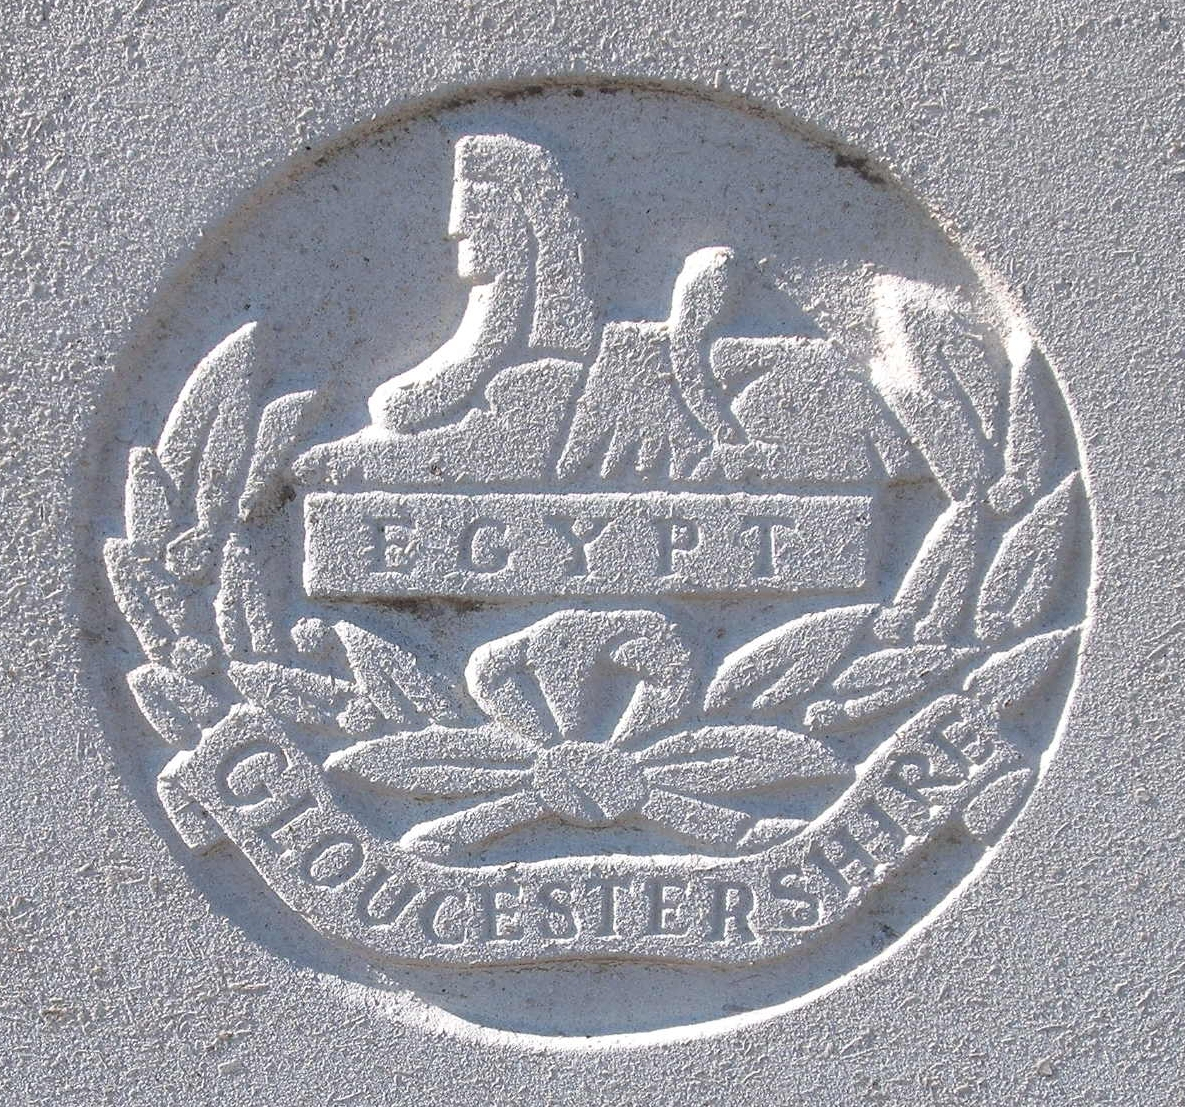 Capbadge of the Gloucestershire Regiment